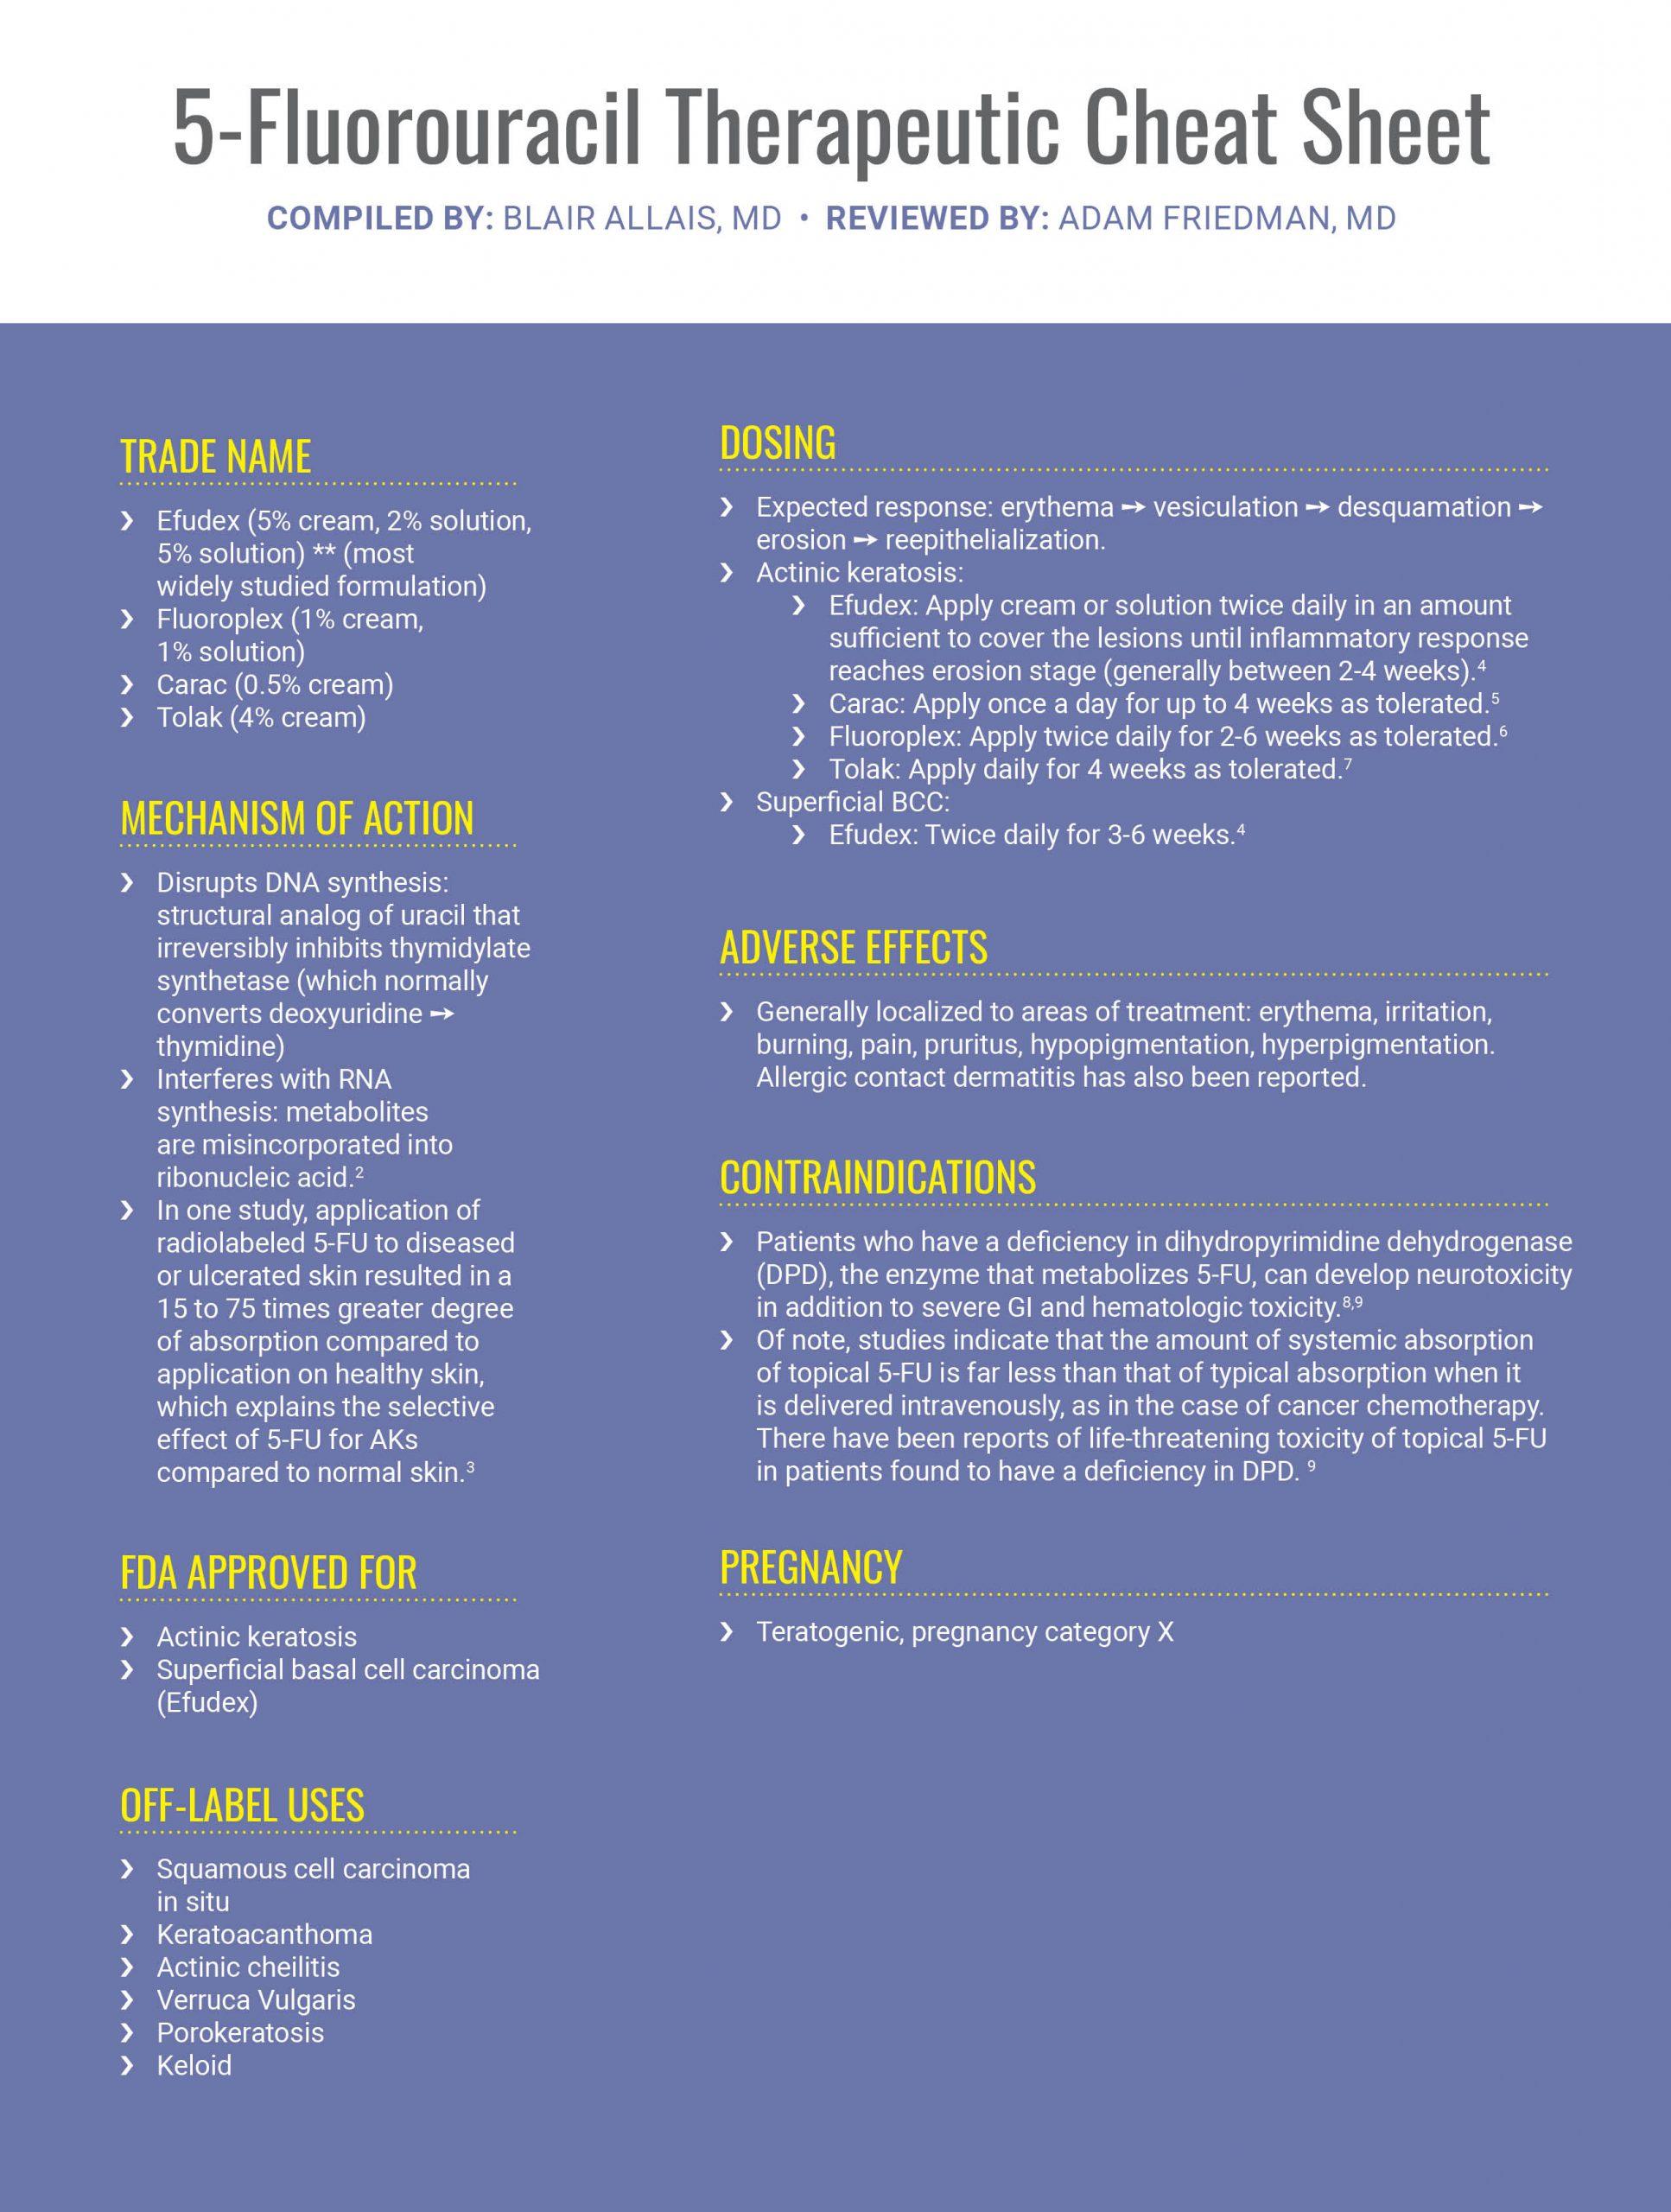 5-Fluorouracil therapeutic cheat sheet